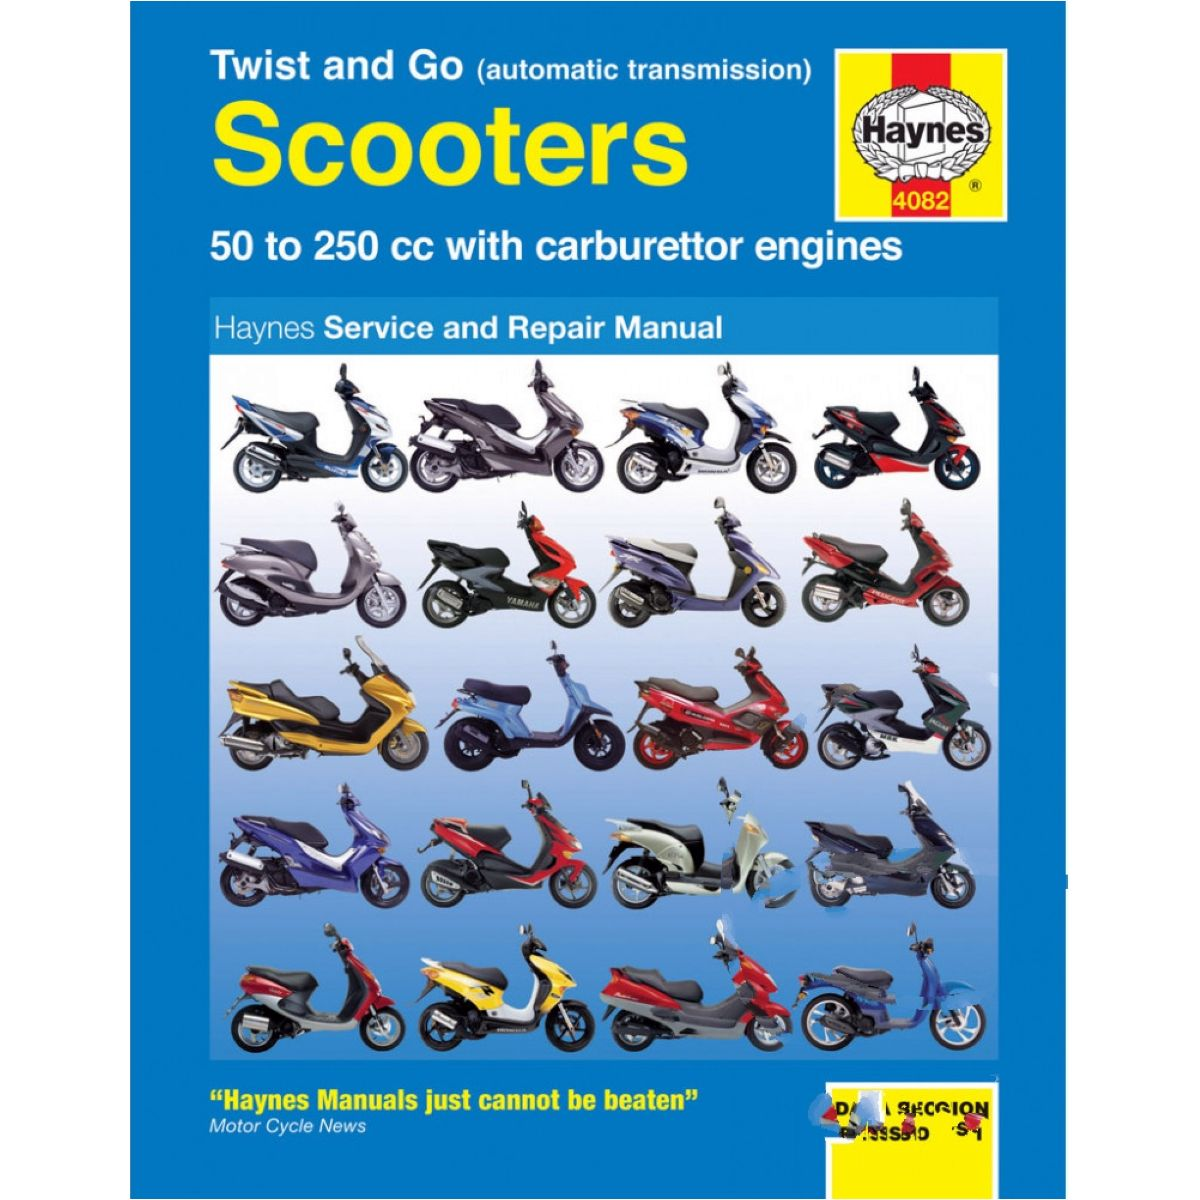 Haynes Repair Manual 4082 Vespa Gt Granturismo 55567 56 Scooter Wiring Schematic Fr 125 M31100 2005 15 Ps 11 Kw